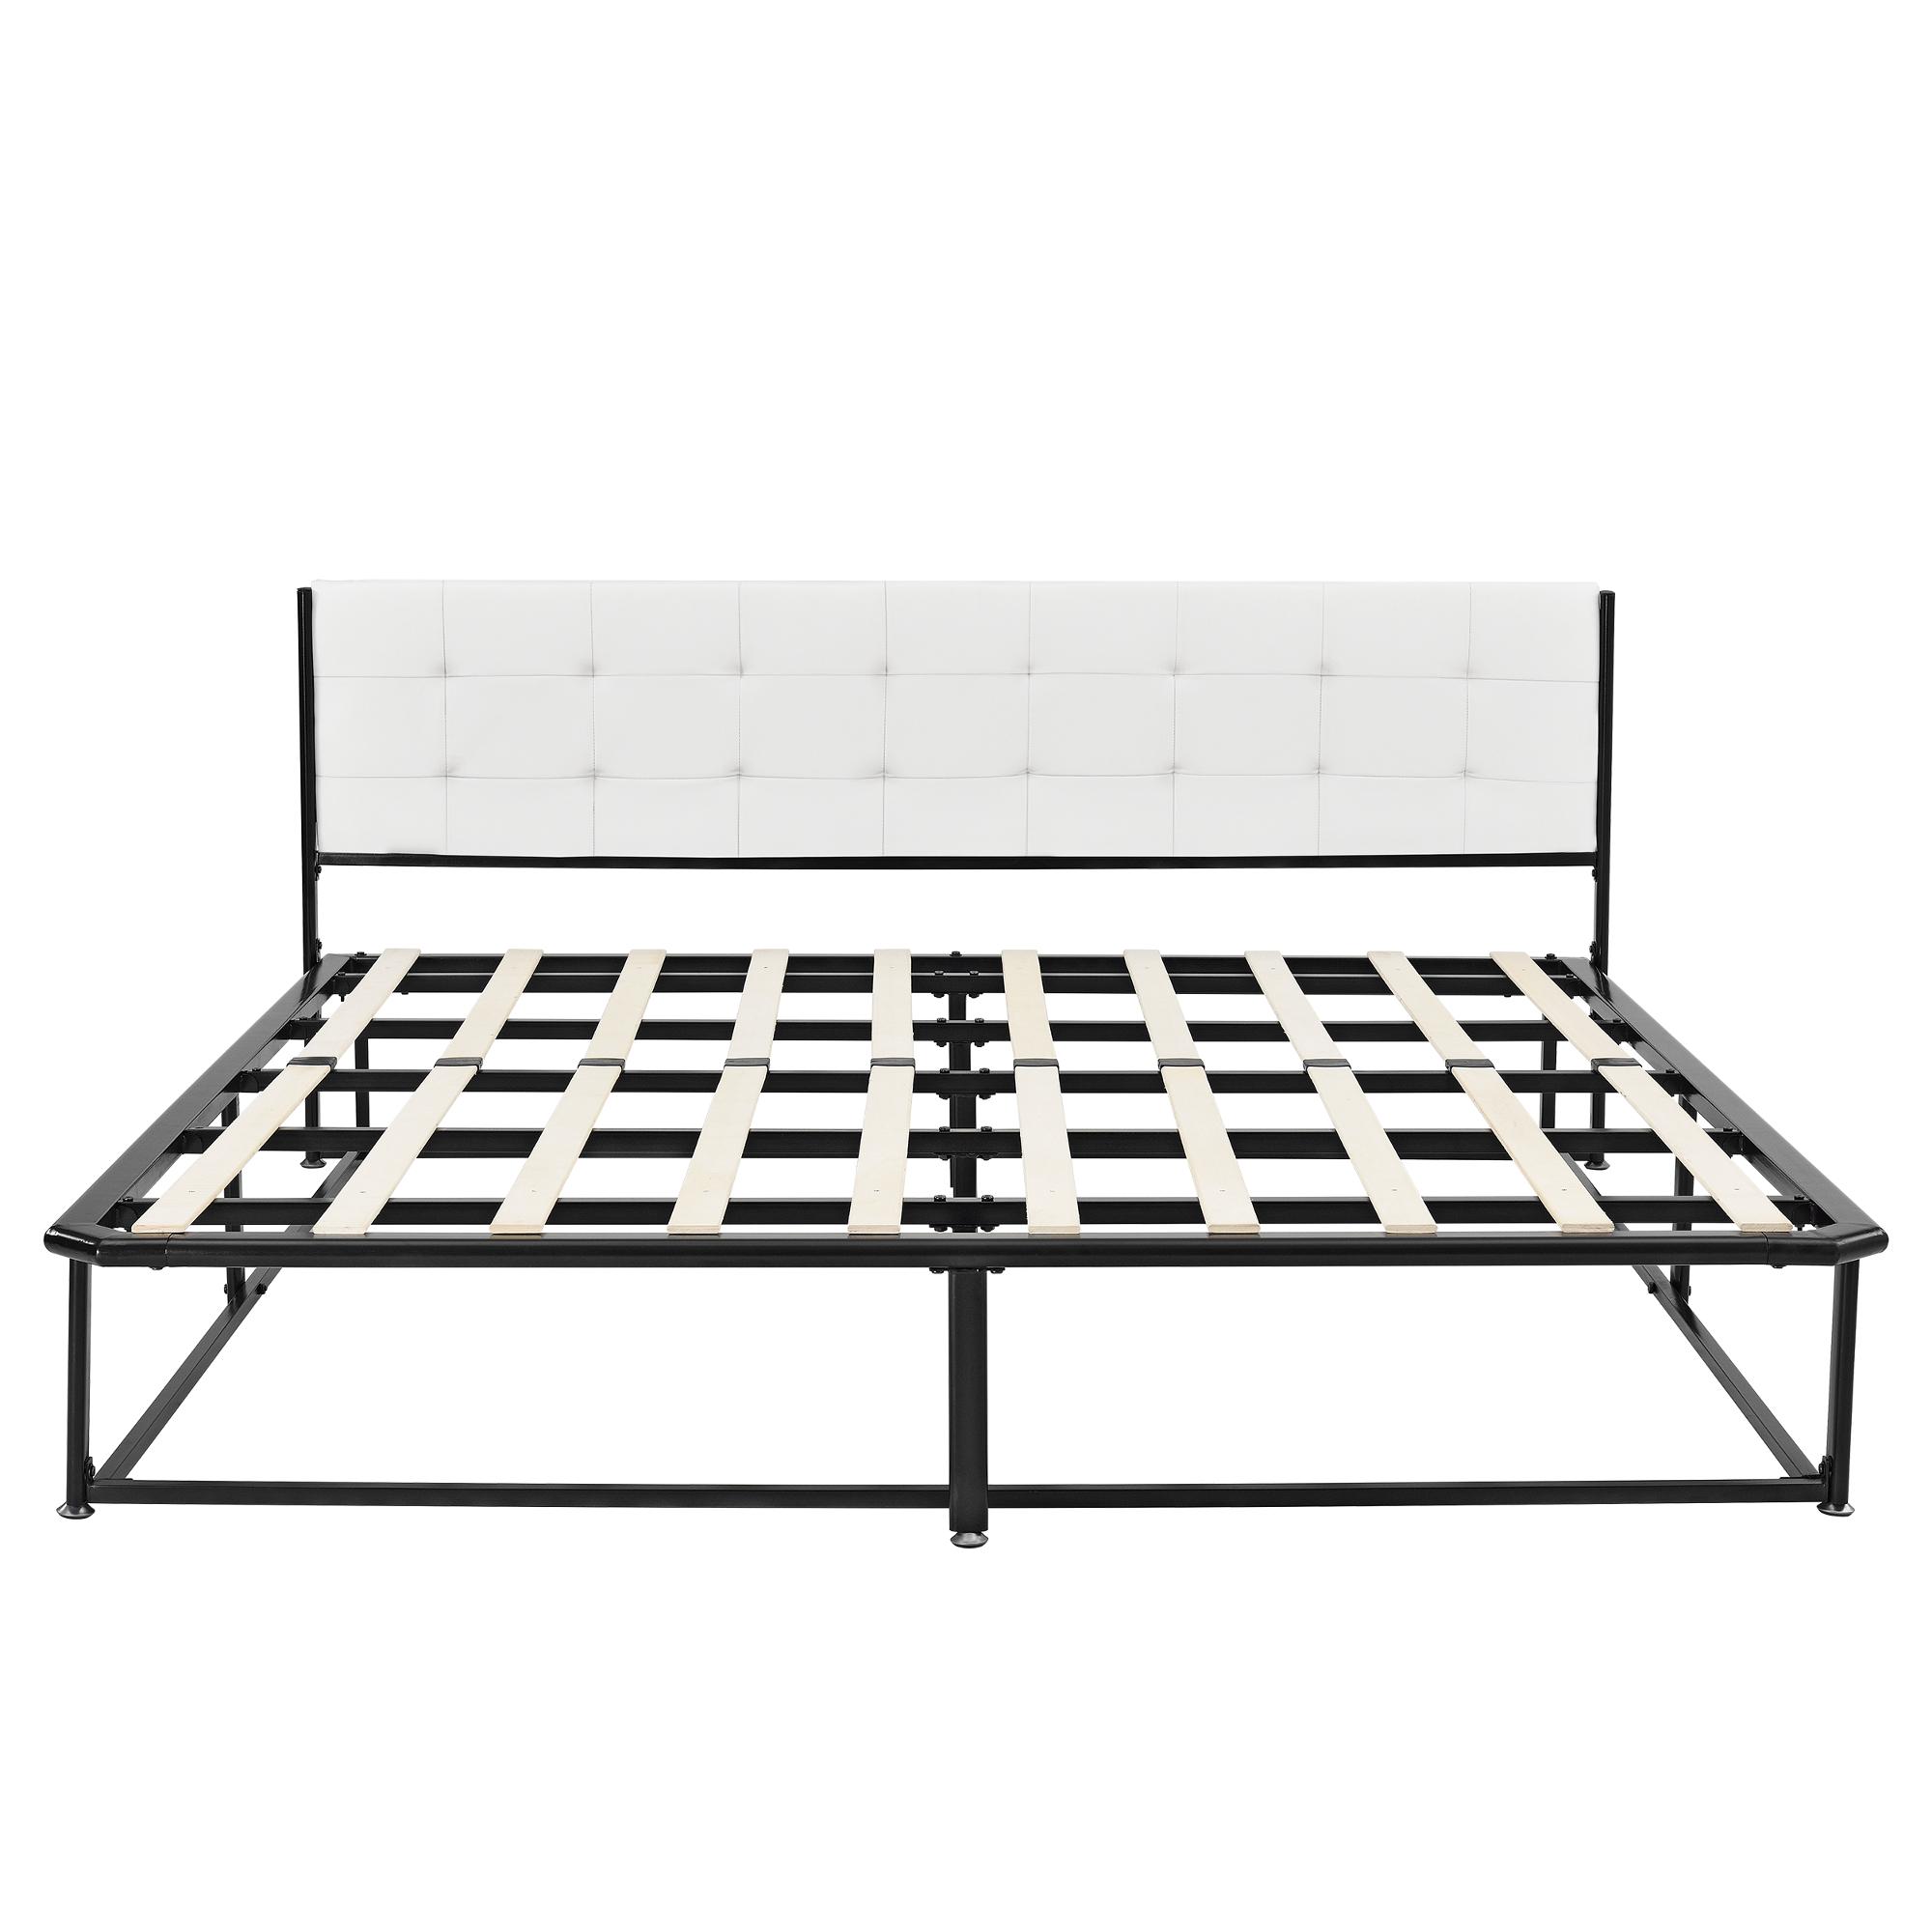 metallbett 140 180 x 200 schwarz grau matratze bett kunstleder textil ebay. Black Bedroom Furniture Sets. Home Design Ideas